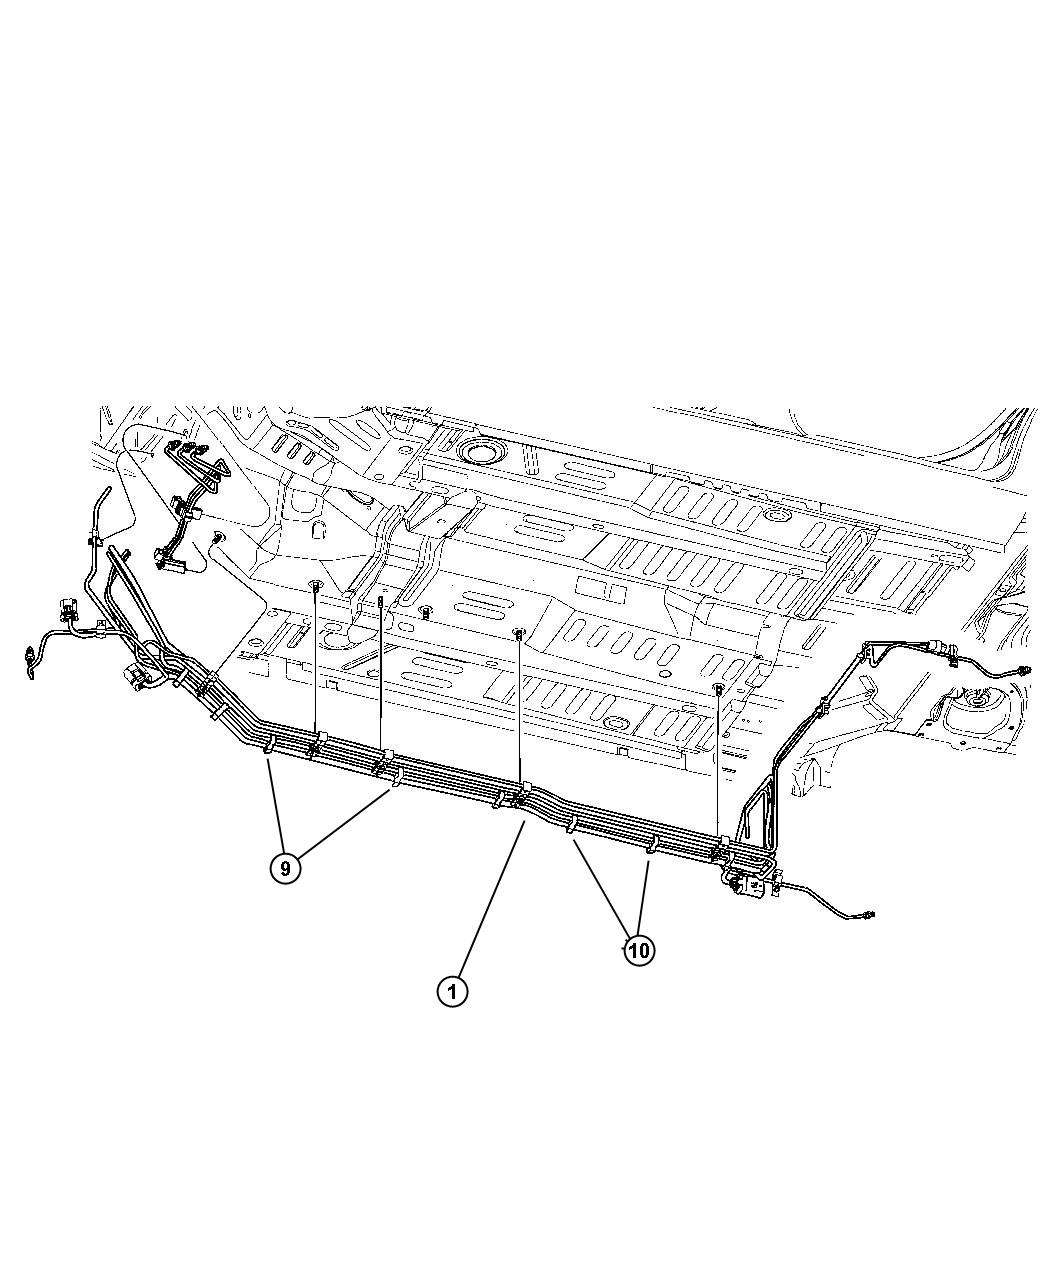 Chrysler Pt Cruiser Tube. Fuel supply. Engine, fuel lines